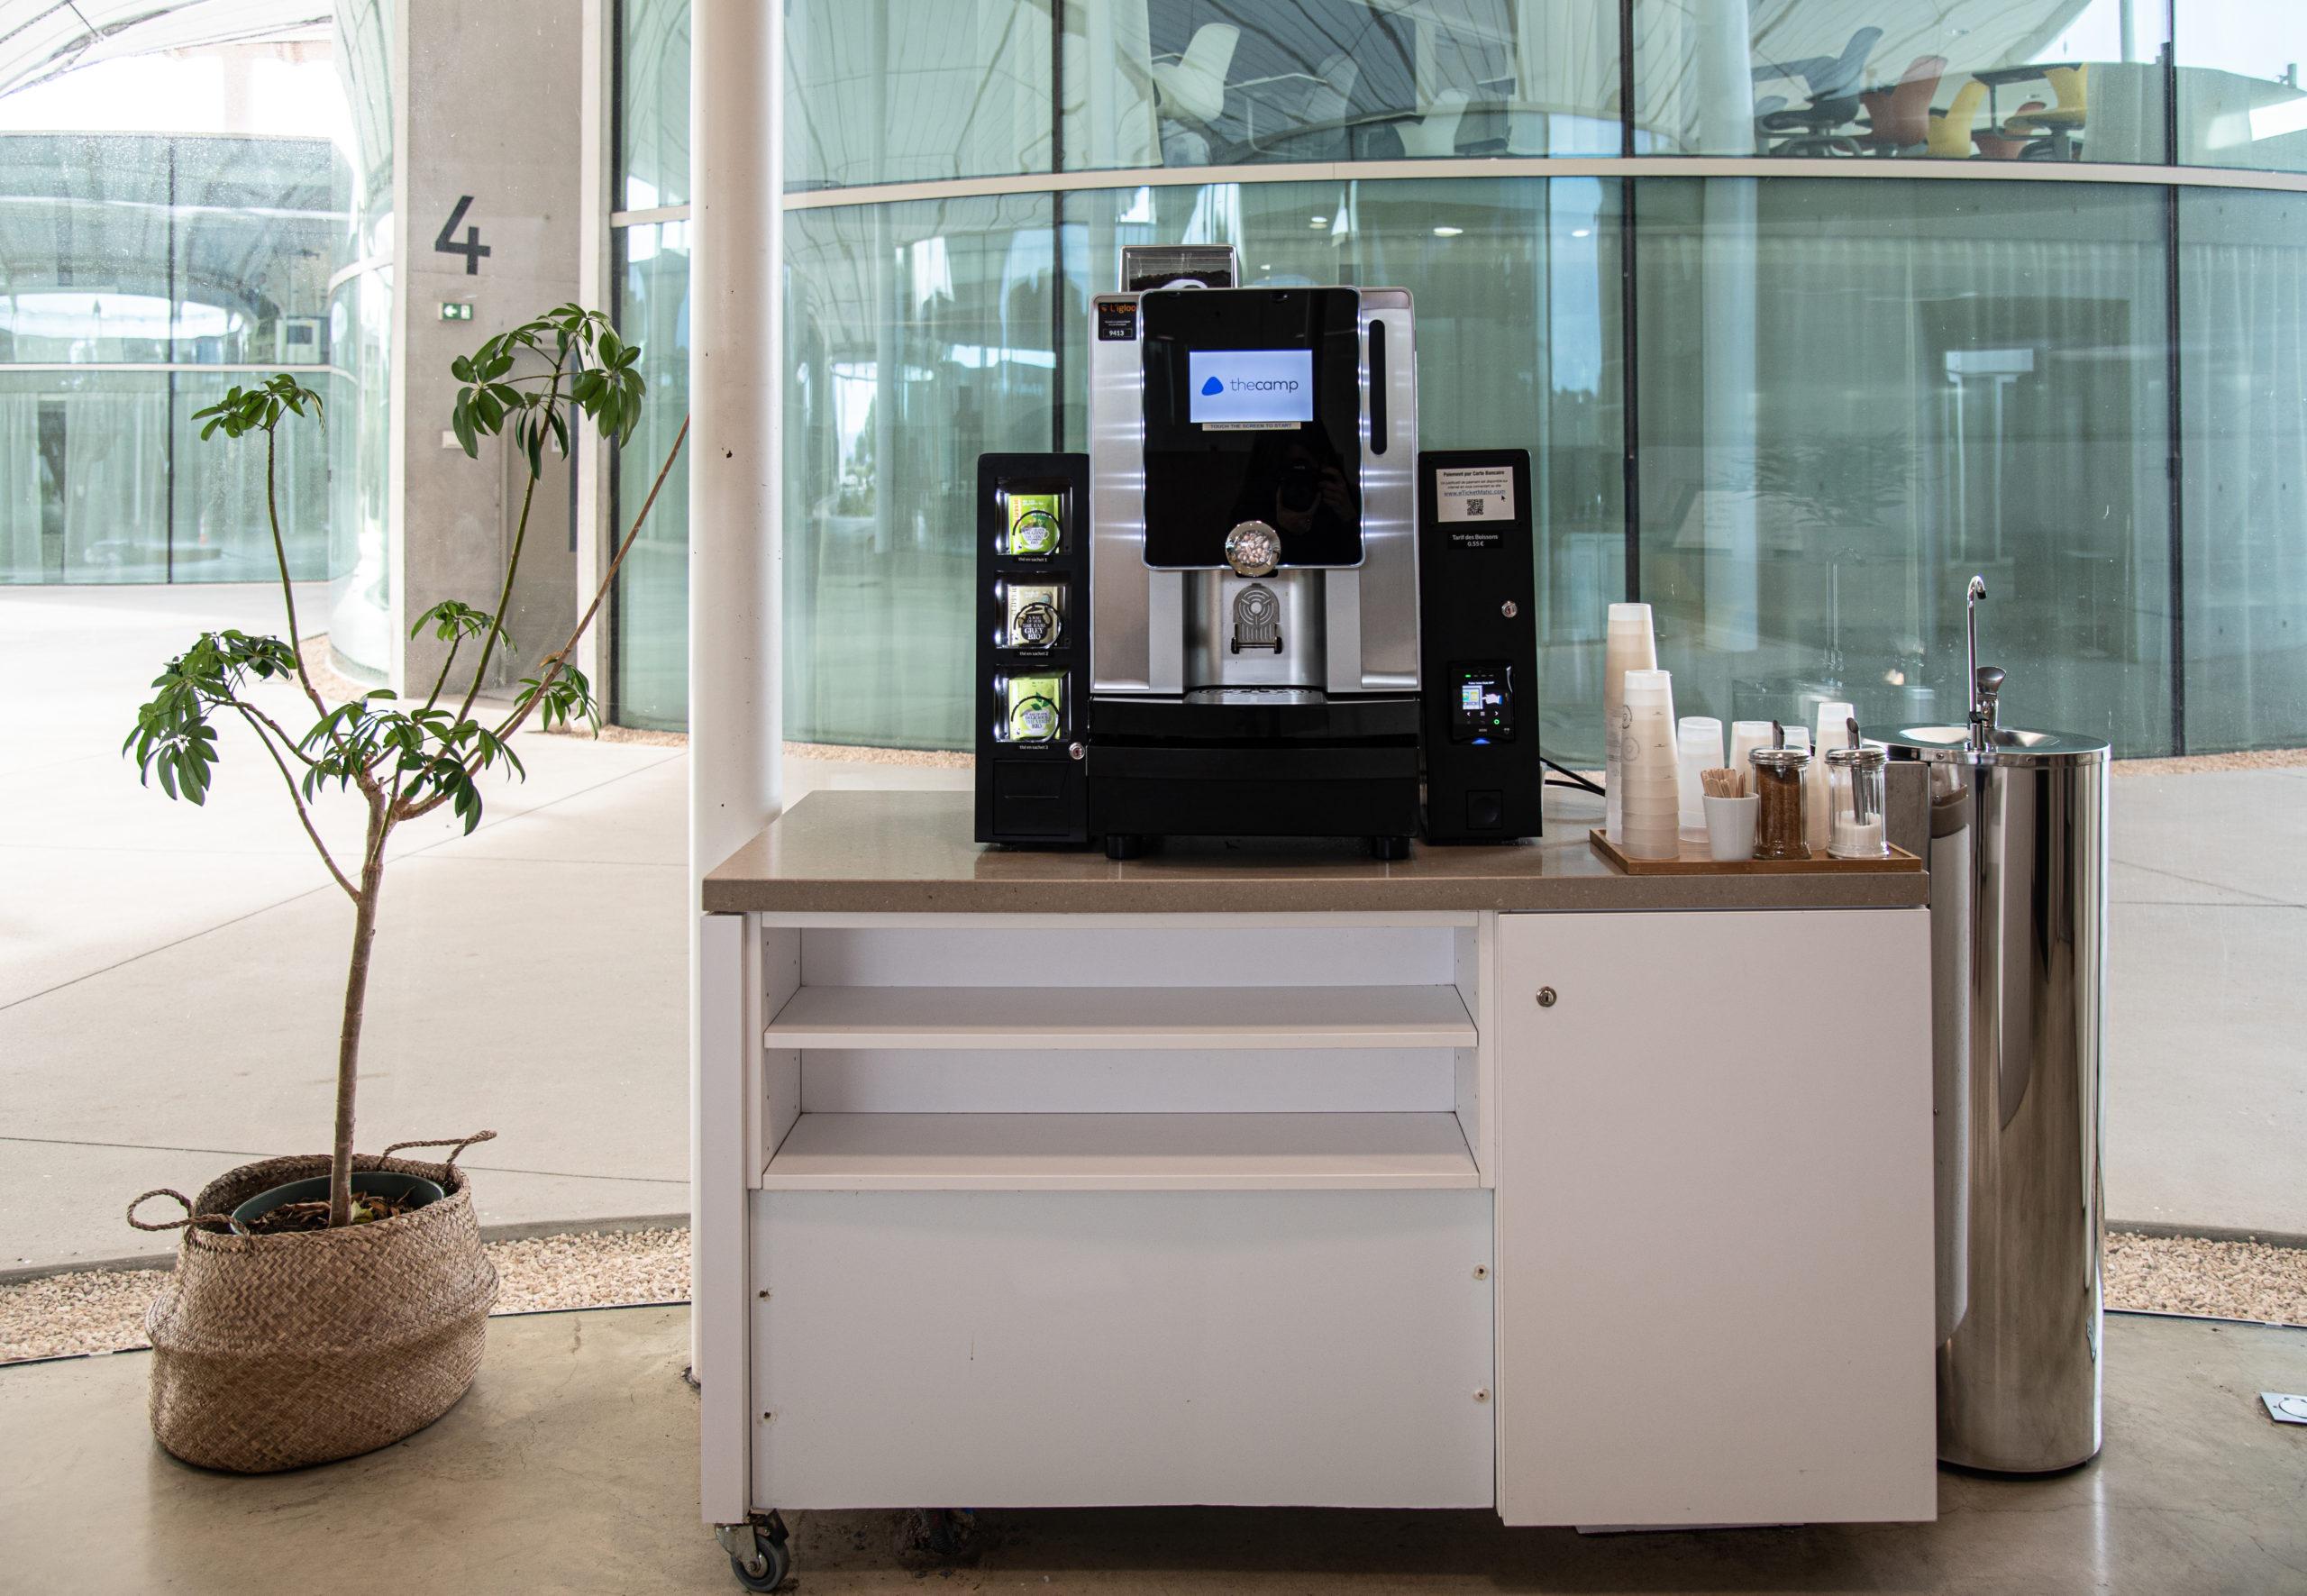 Machine boisson chaude bureau l'Igloo DA